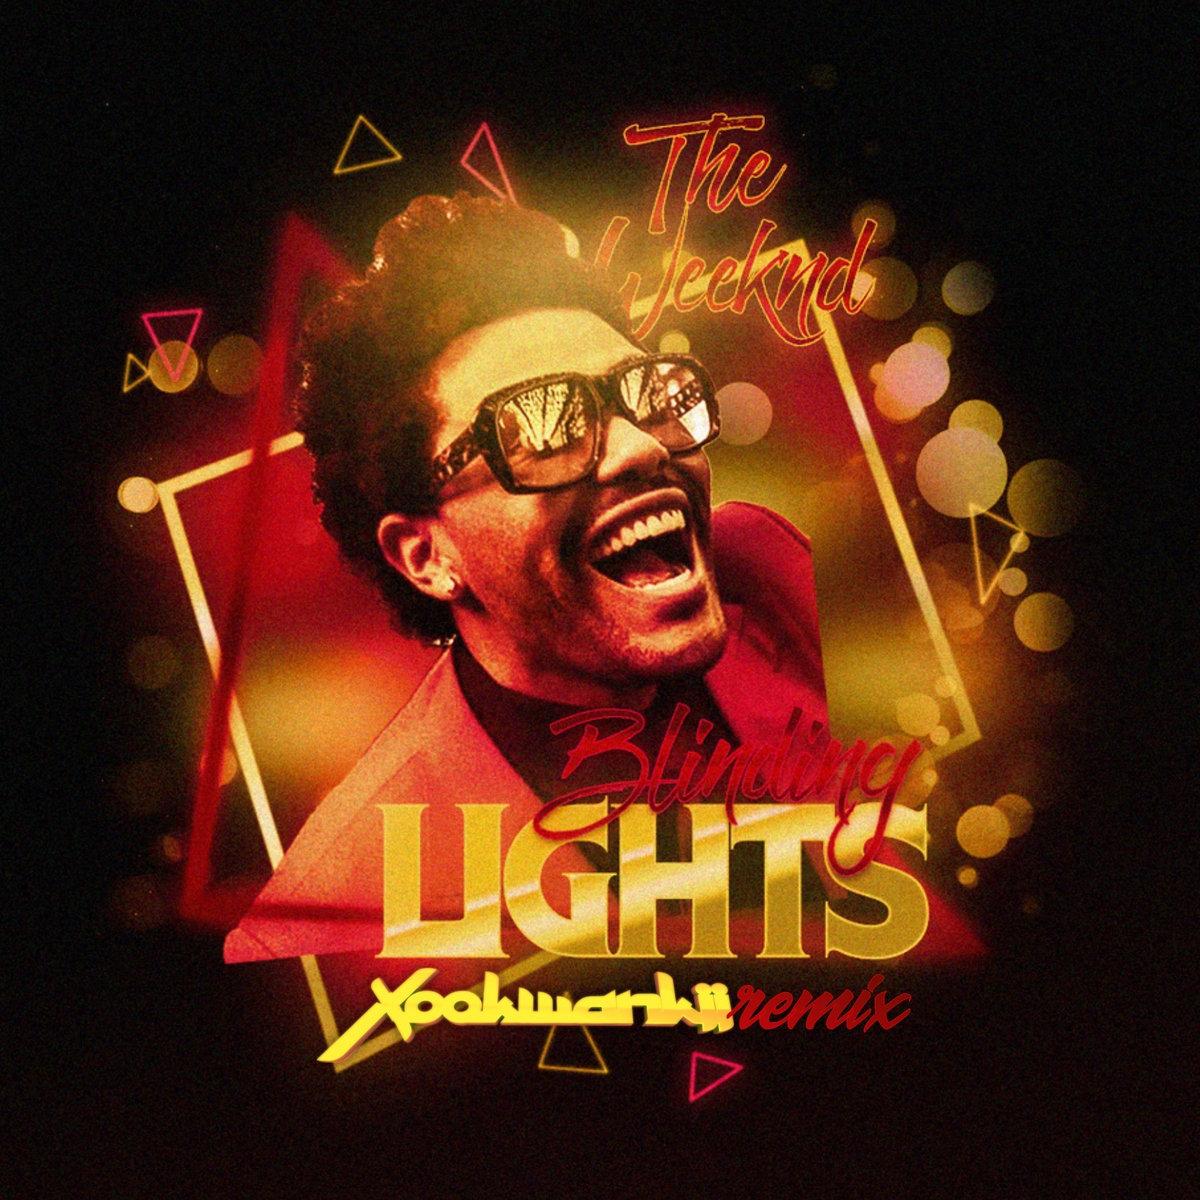 blinding lights xookwankii remix